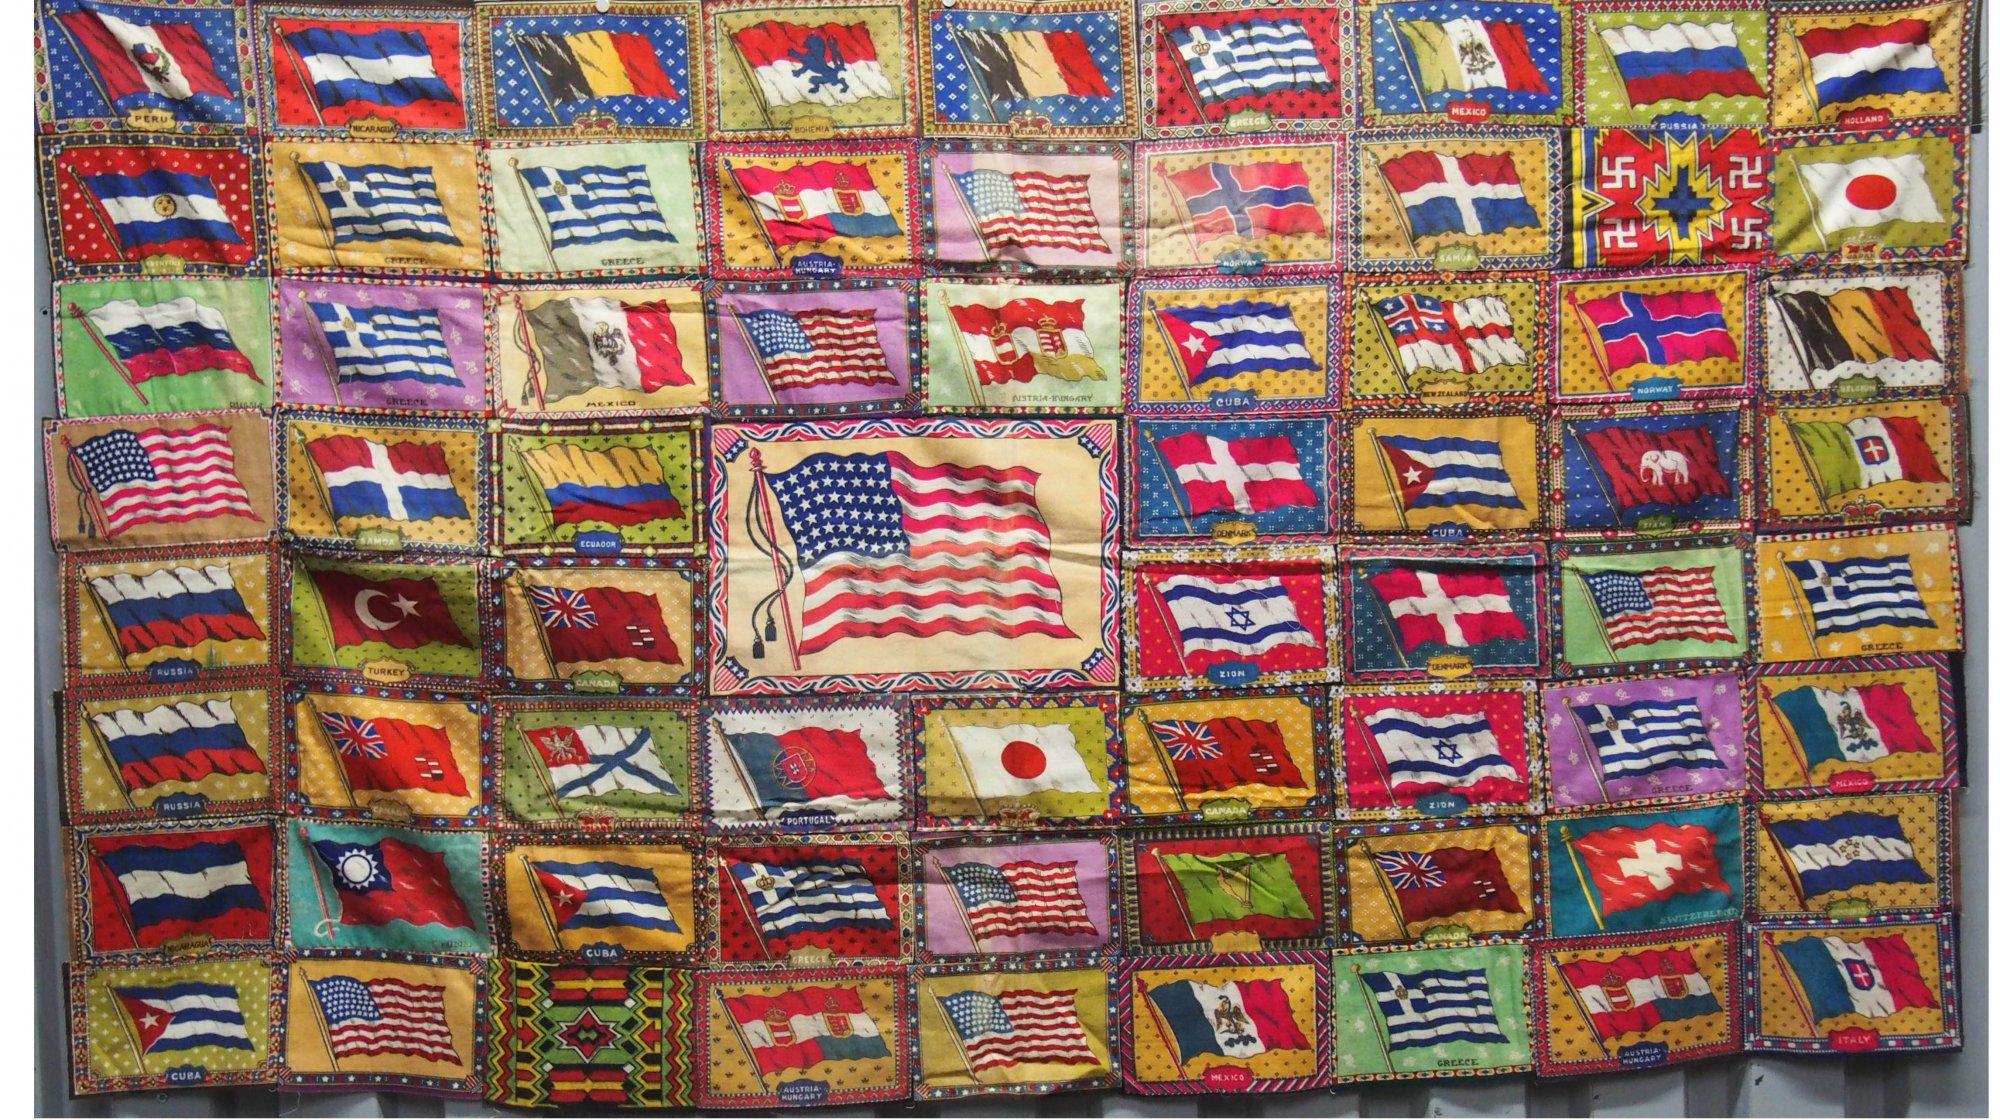 TOBACCO FLANNELS INTERNATIONAL FLAGS ANTIQUE PIECED QUILT